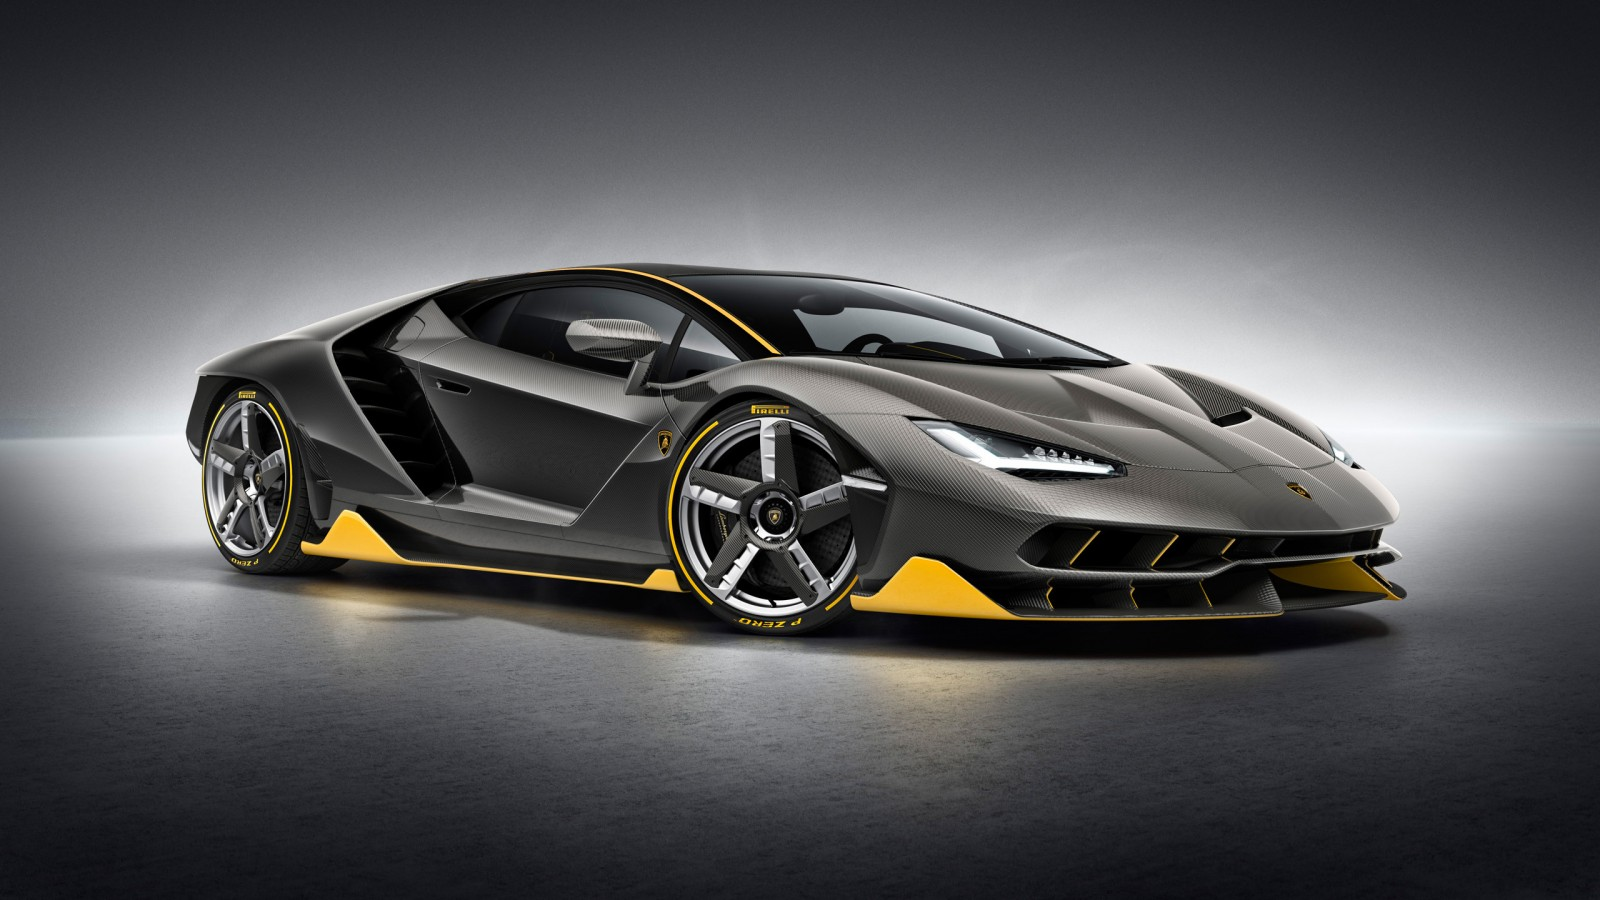 2016 Lamborghini Centenario Wallpaper | HD Car Wallpapers